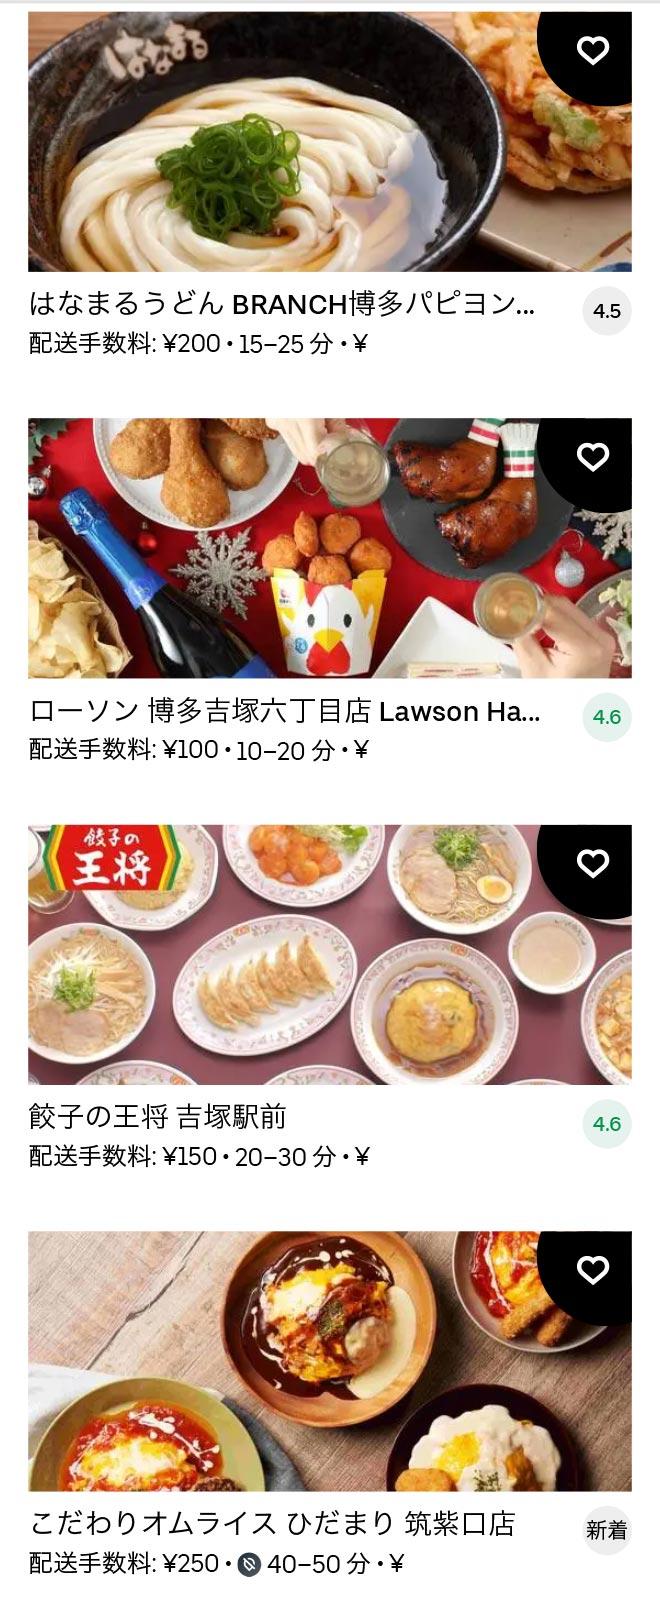 Hakozaki menu 2101 03